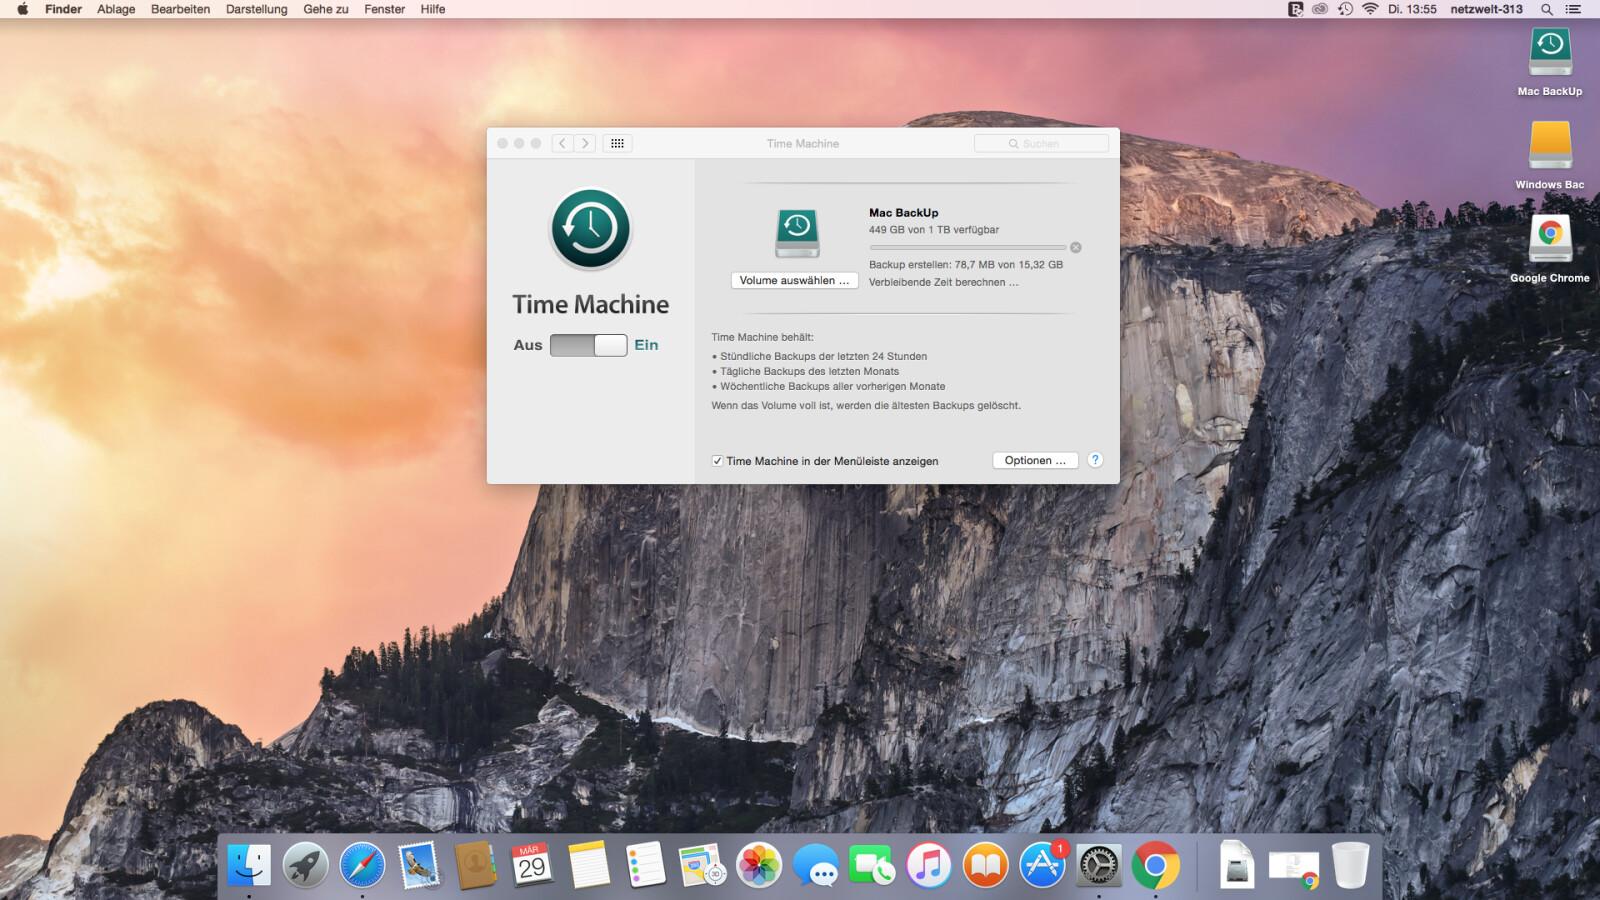 time machine backup vorbereiten dauert ewig